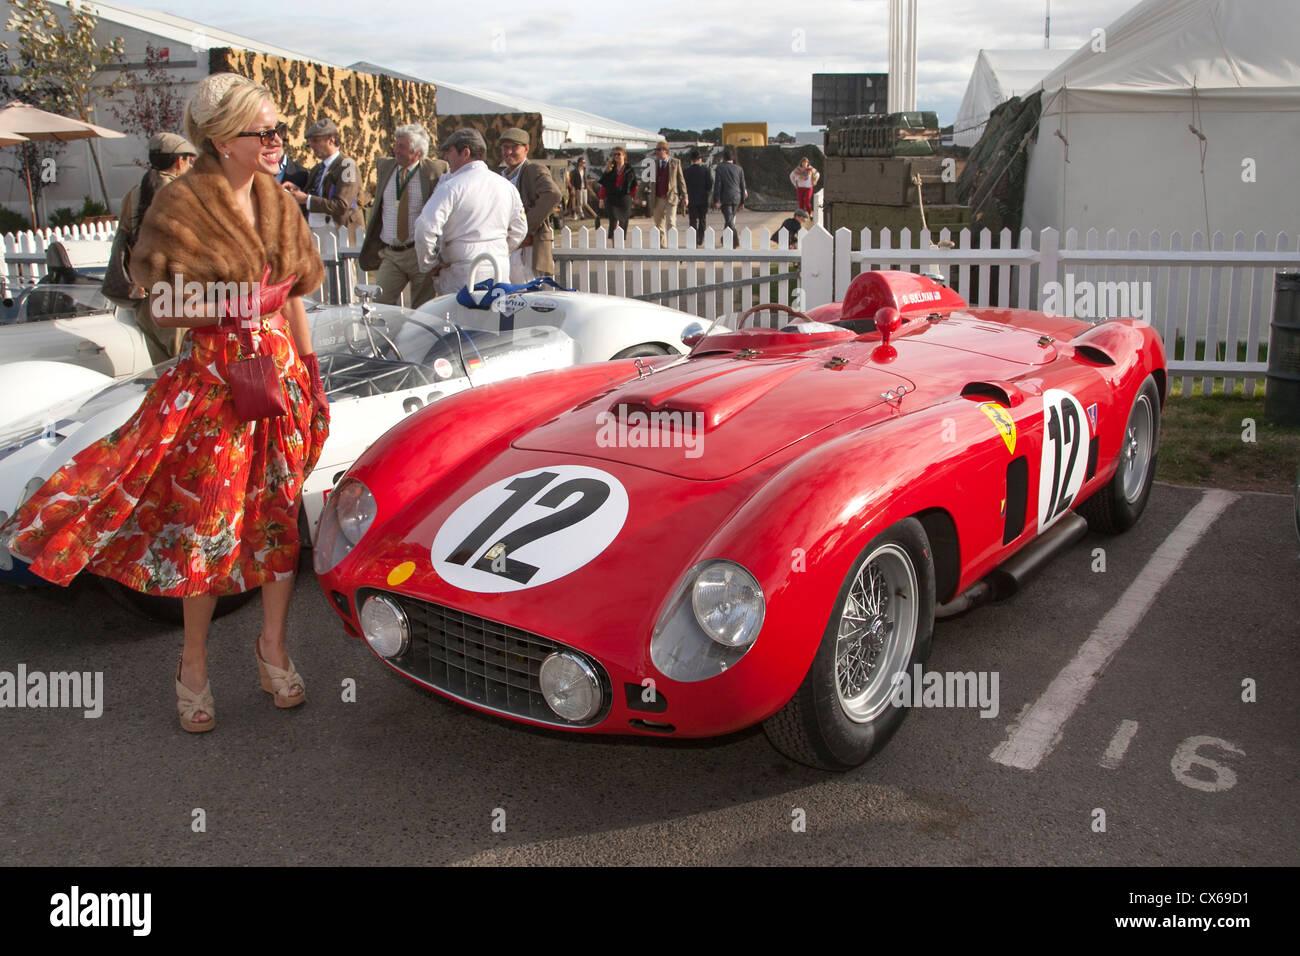 Ferrari-Besitzer beim Goodwood Revival. 1956 860 Monza Stockbild